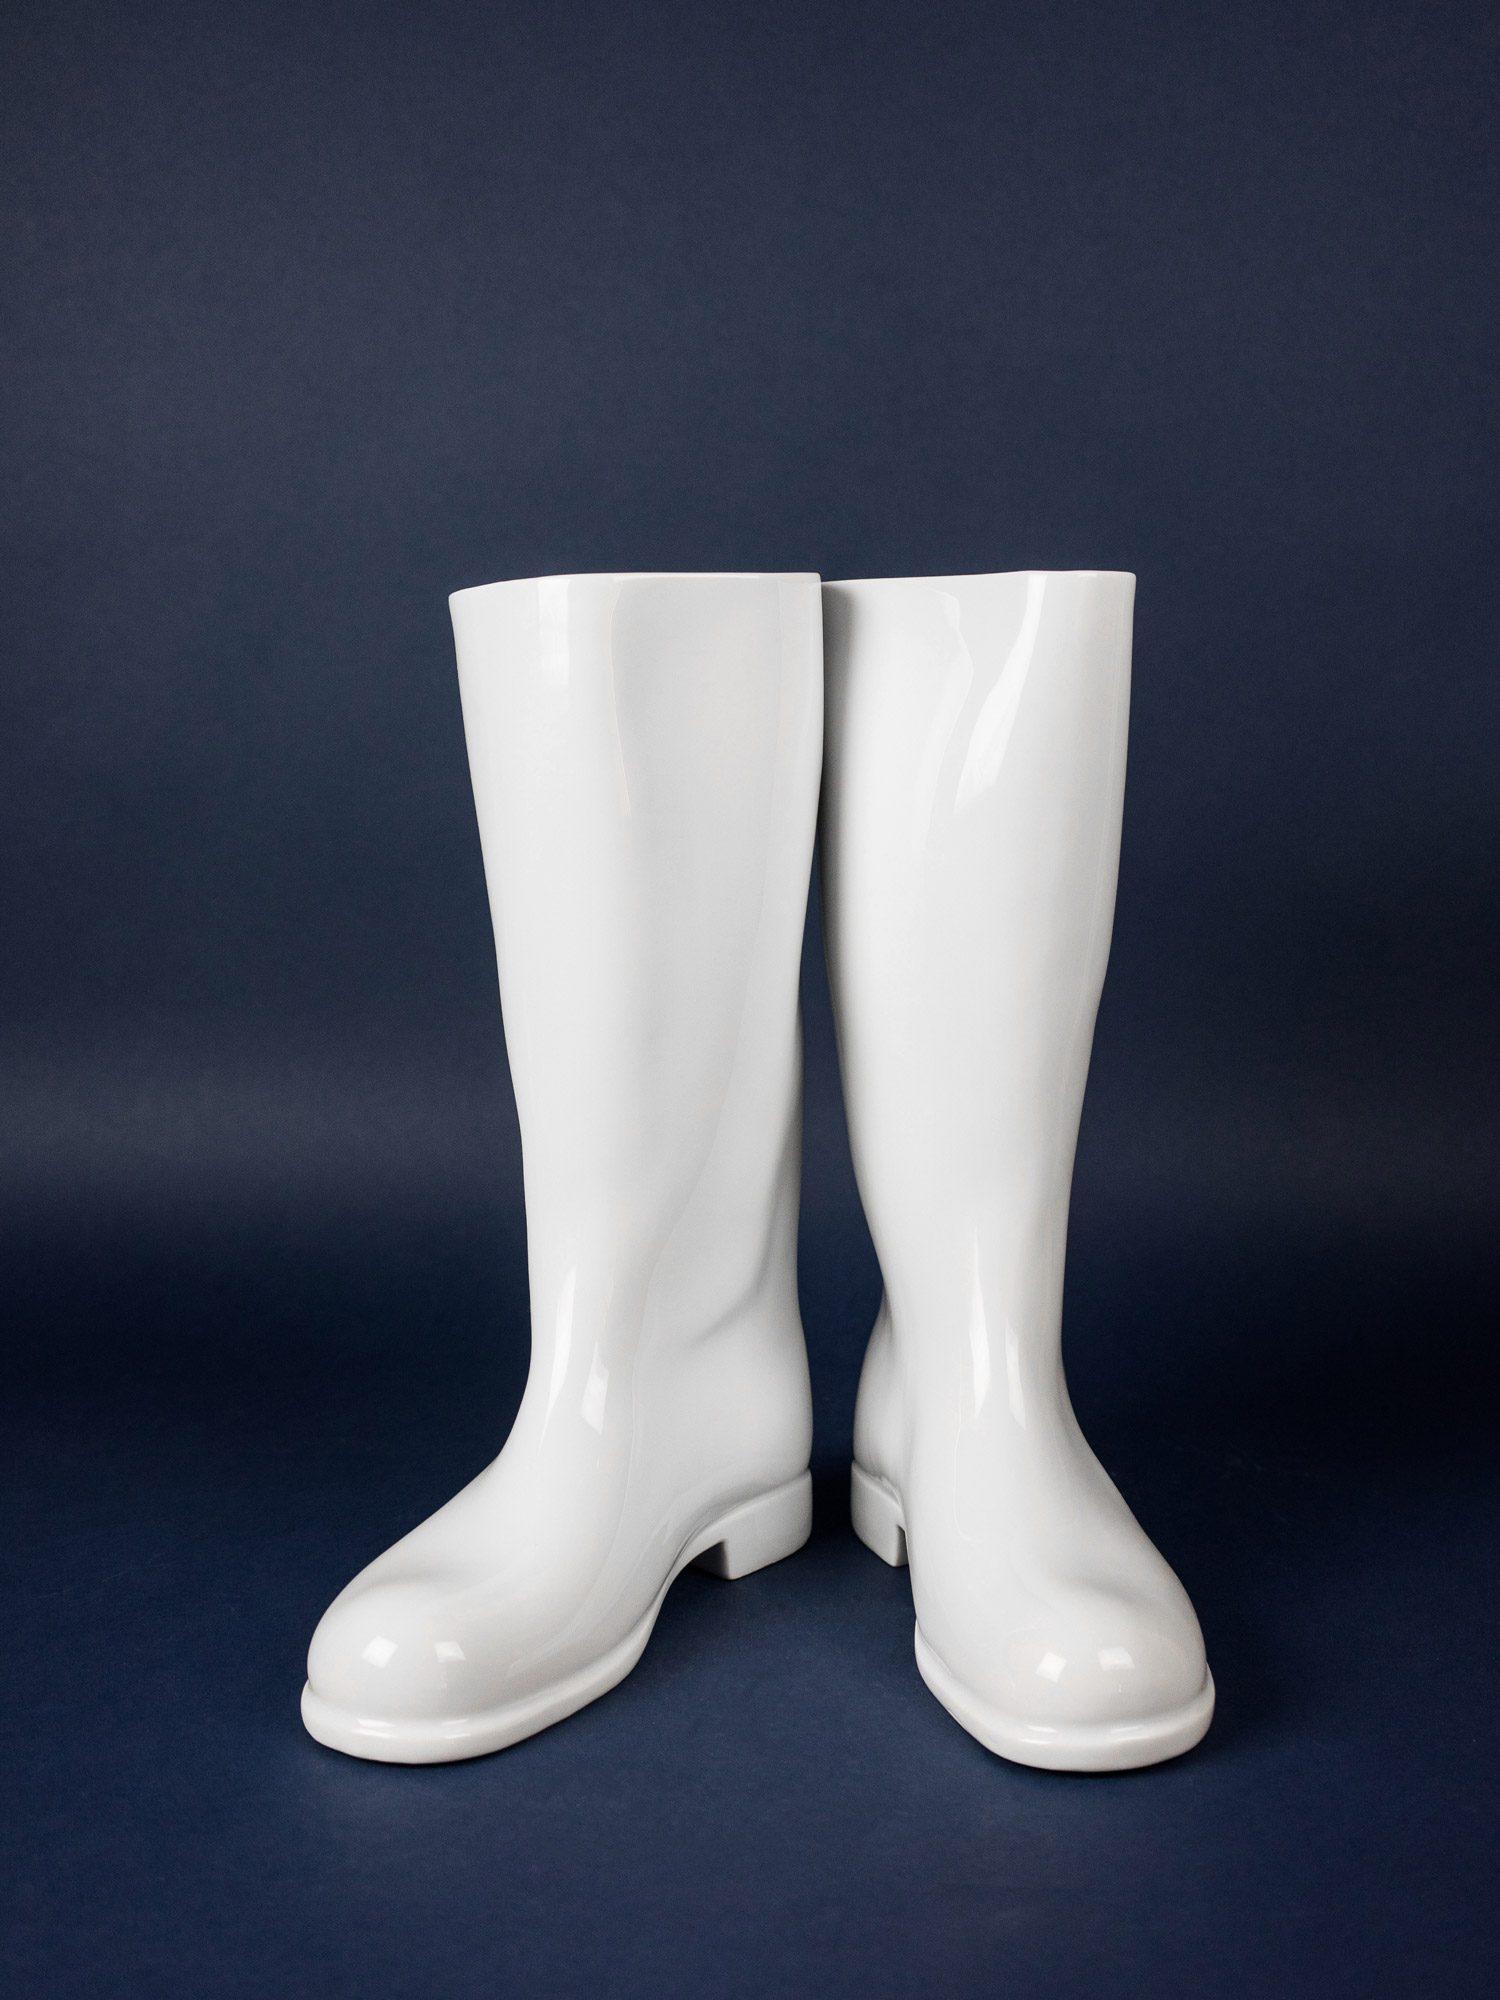 White, porcelain boot vases by Qubus on blue backround.